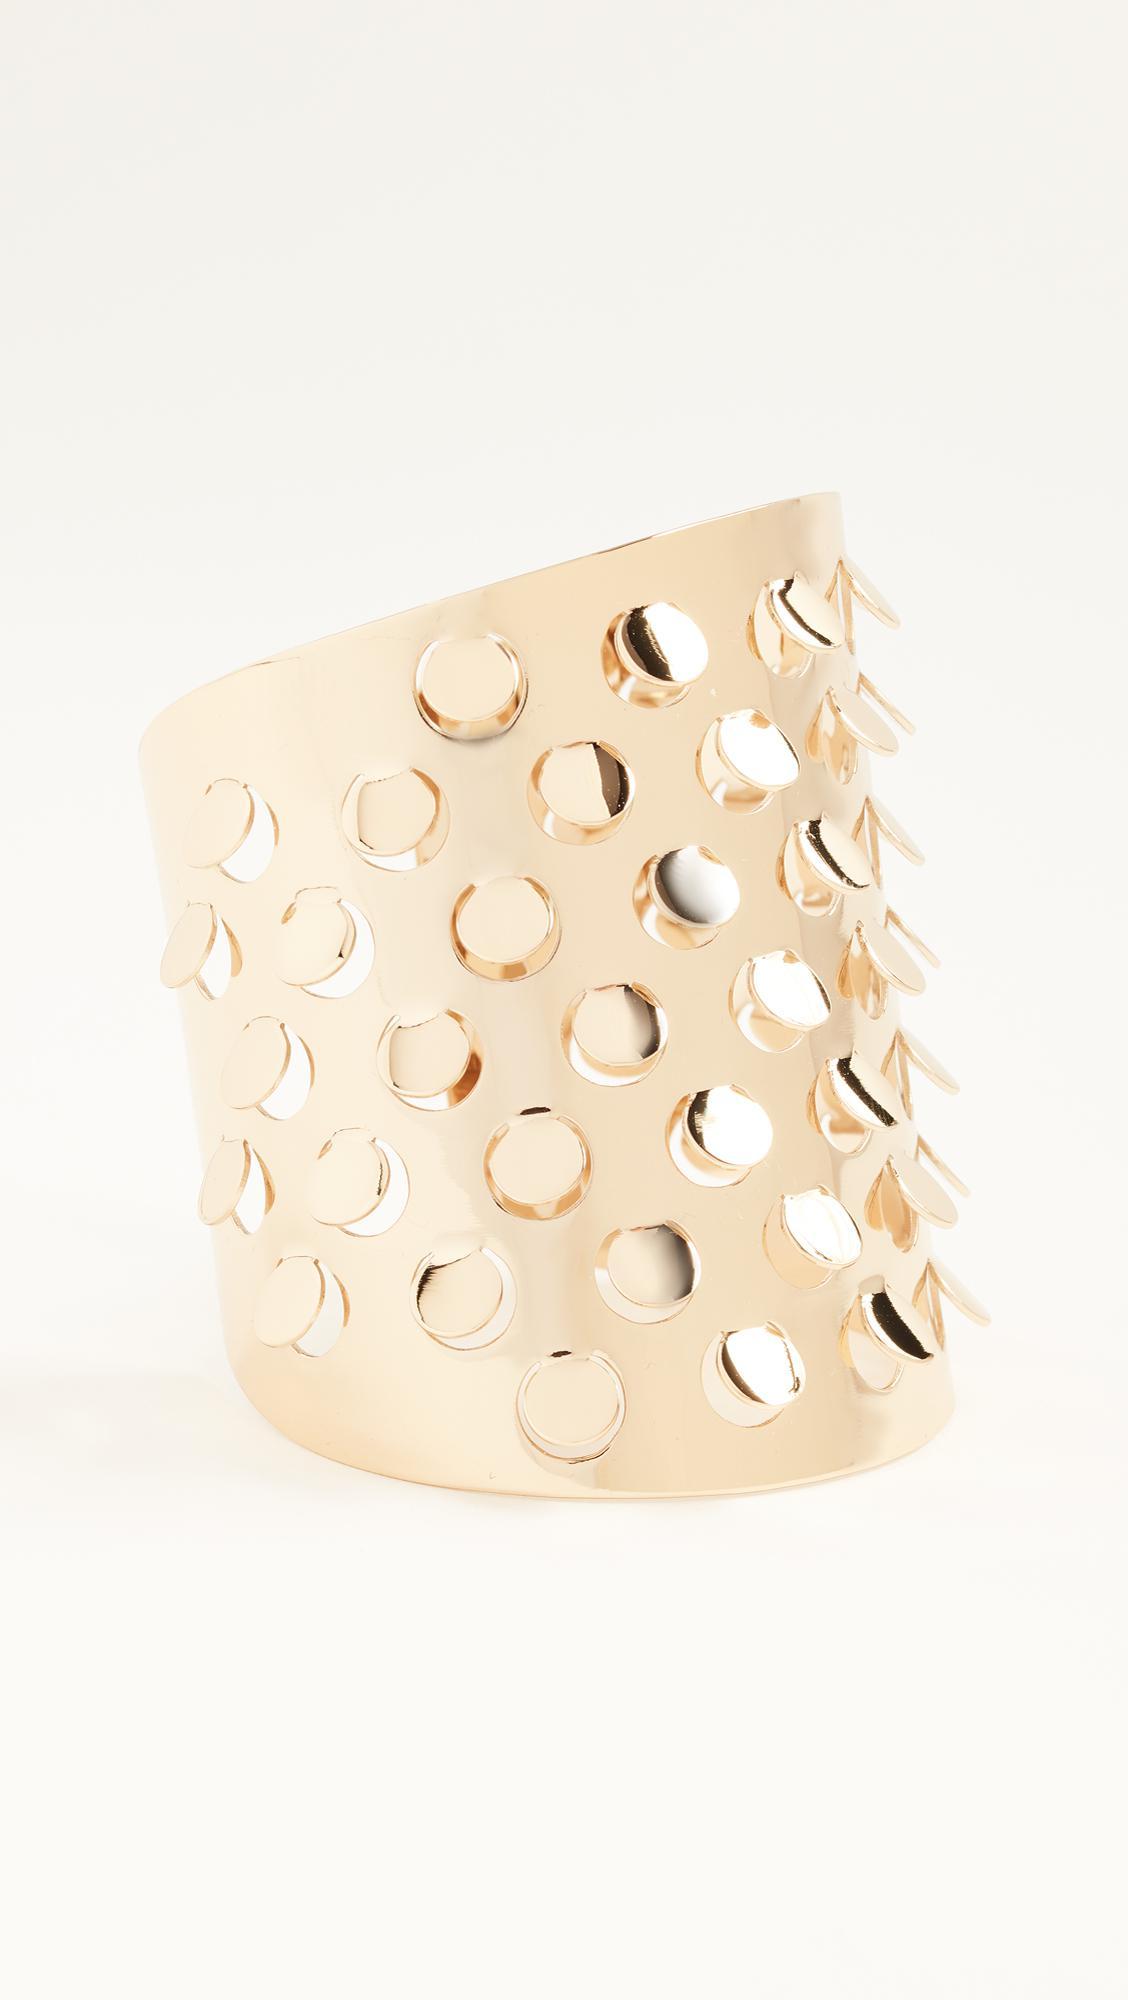 Alexis Bittar Grater Cuff Bracelet QpwgJXcdb